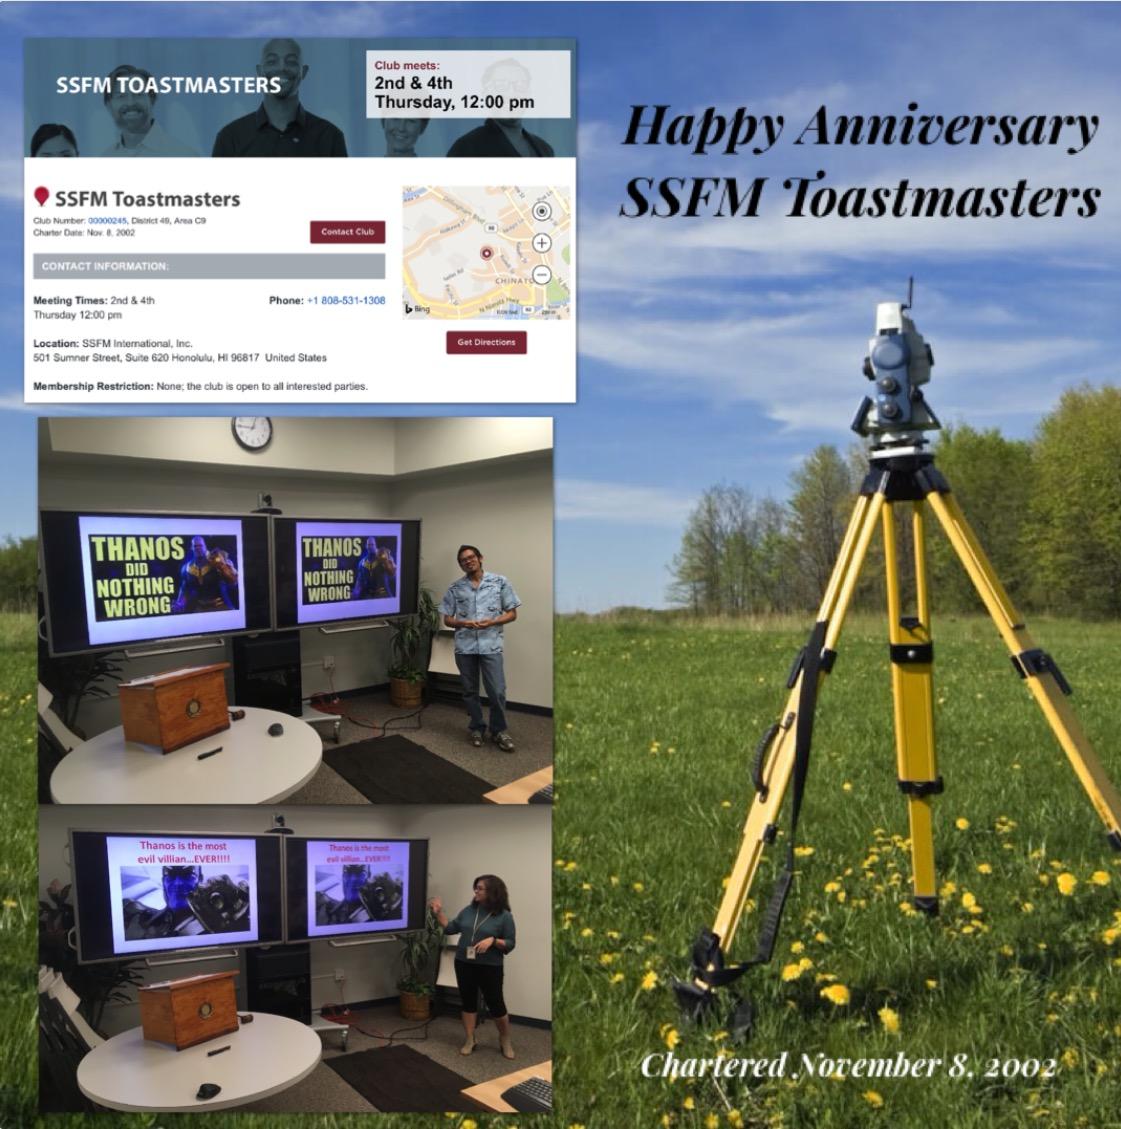 SSFM Toastmasters Anniversary Flyer